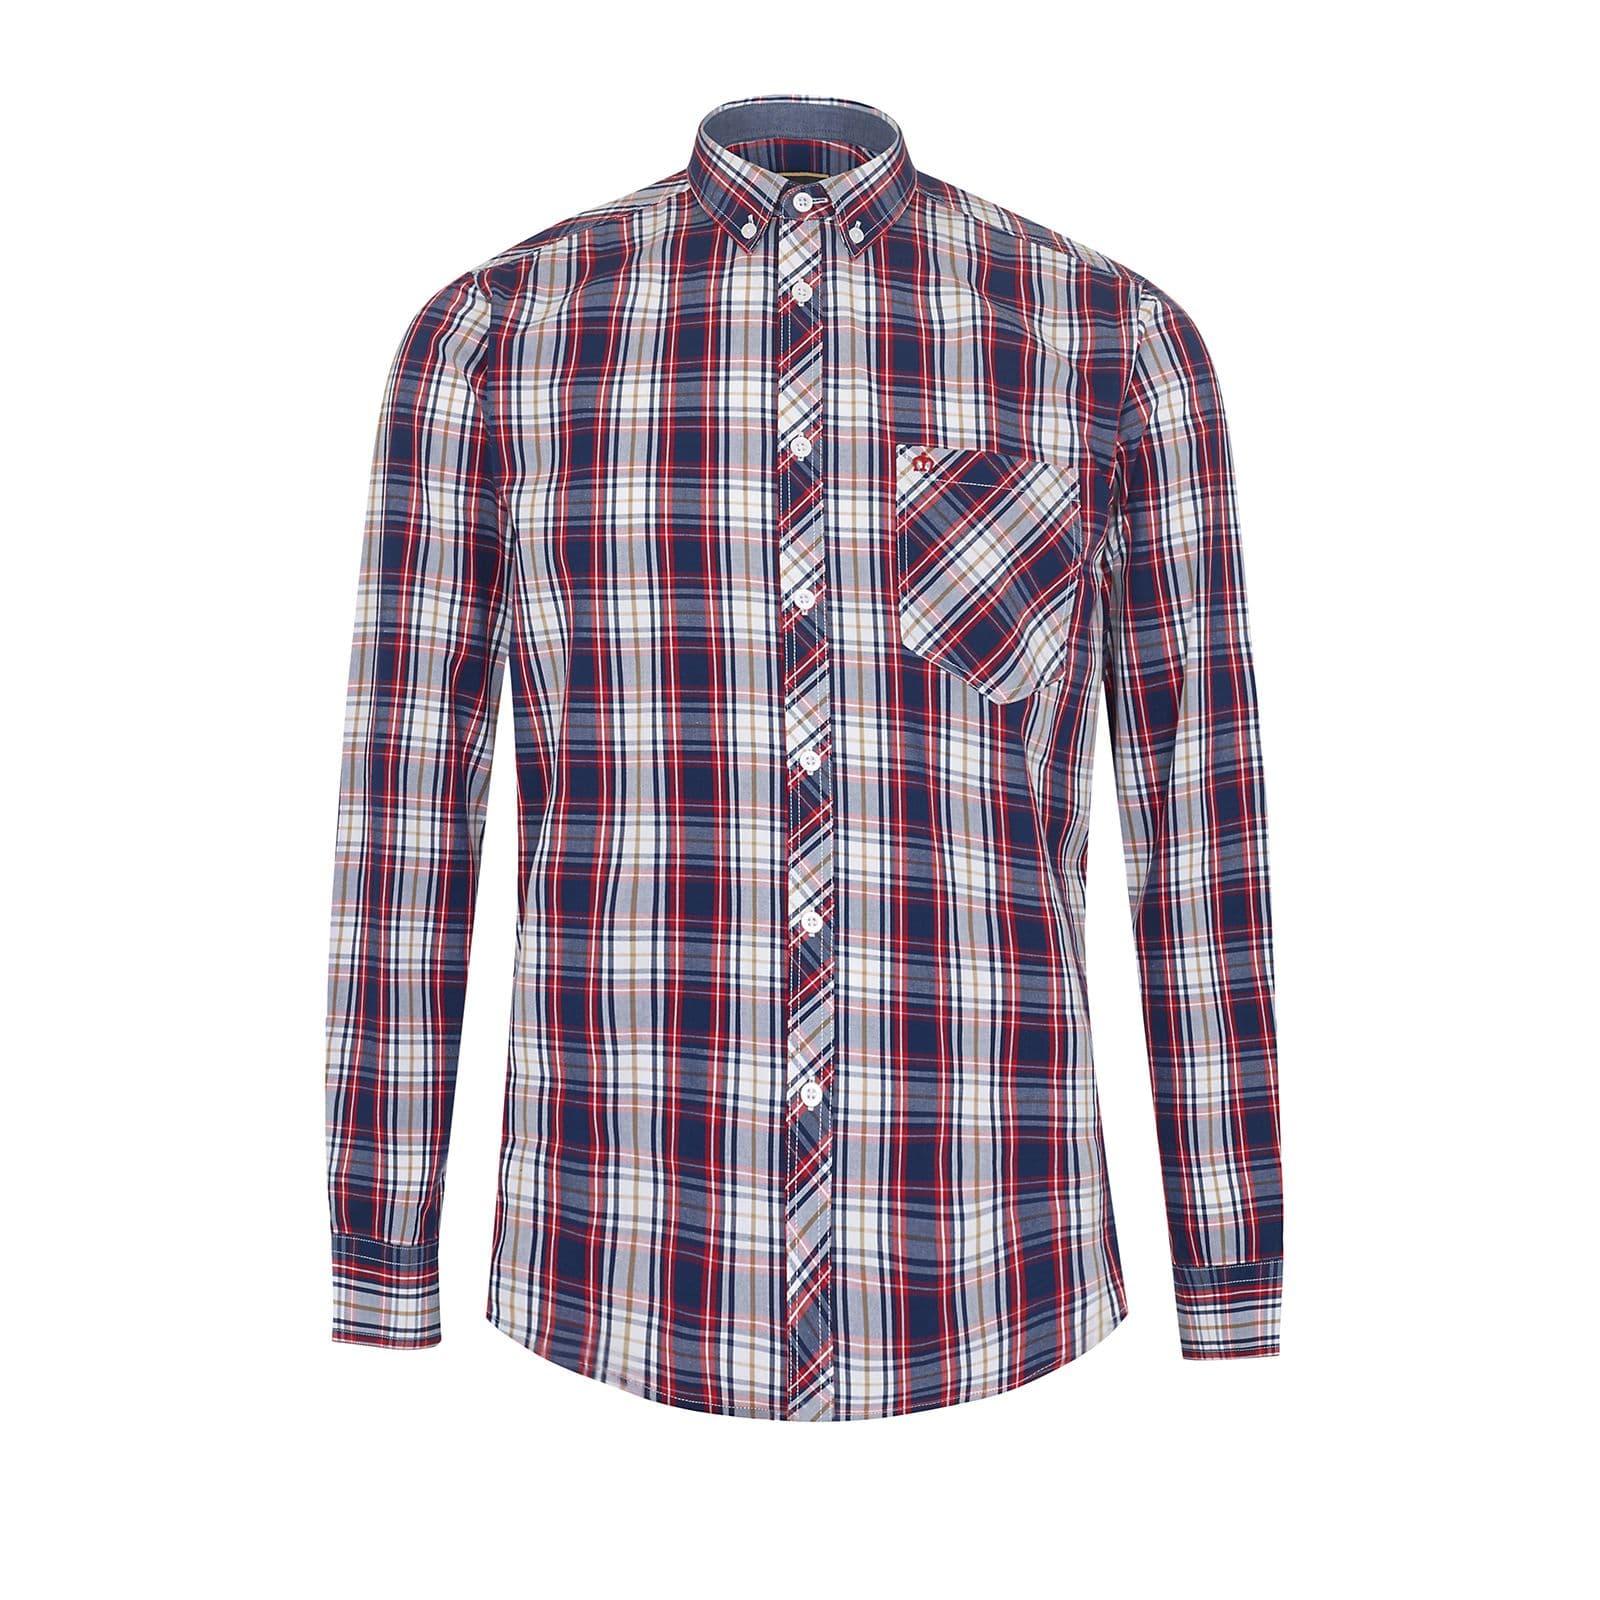 Рубашка FrankРубашки под заказ<br><br><br>Артикул: 1517210<br>Материал: 100% хлопок<br>Цвет: мультицветная клетка<br>Пол: Мужской